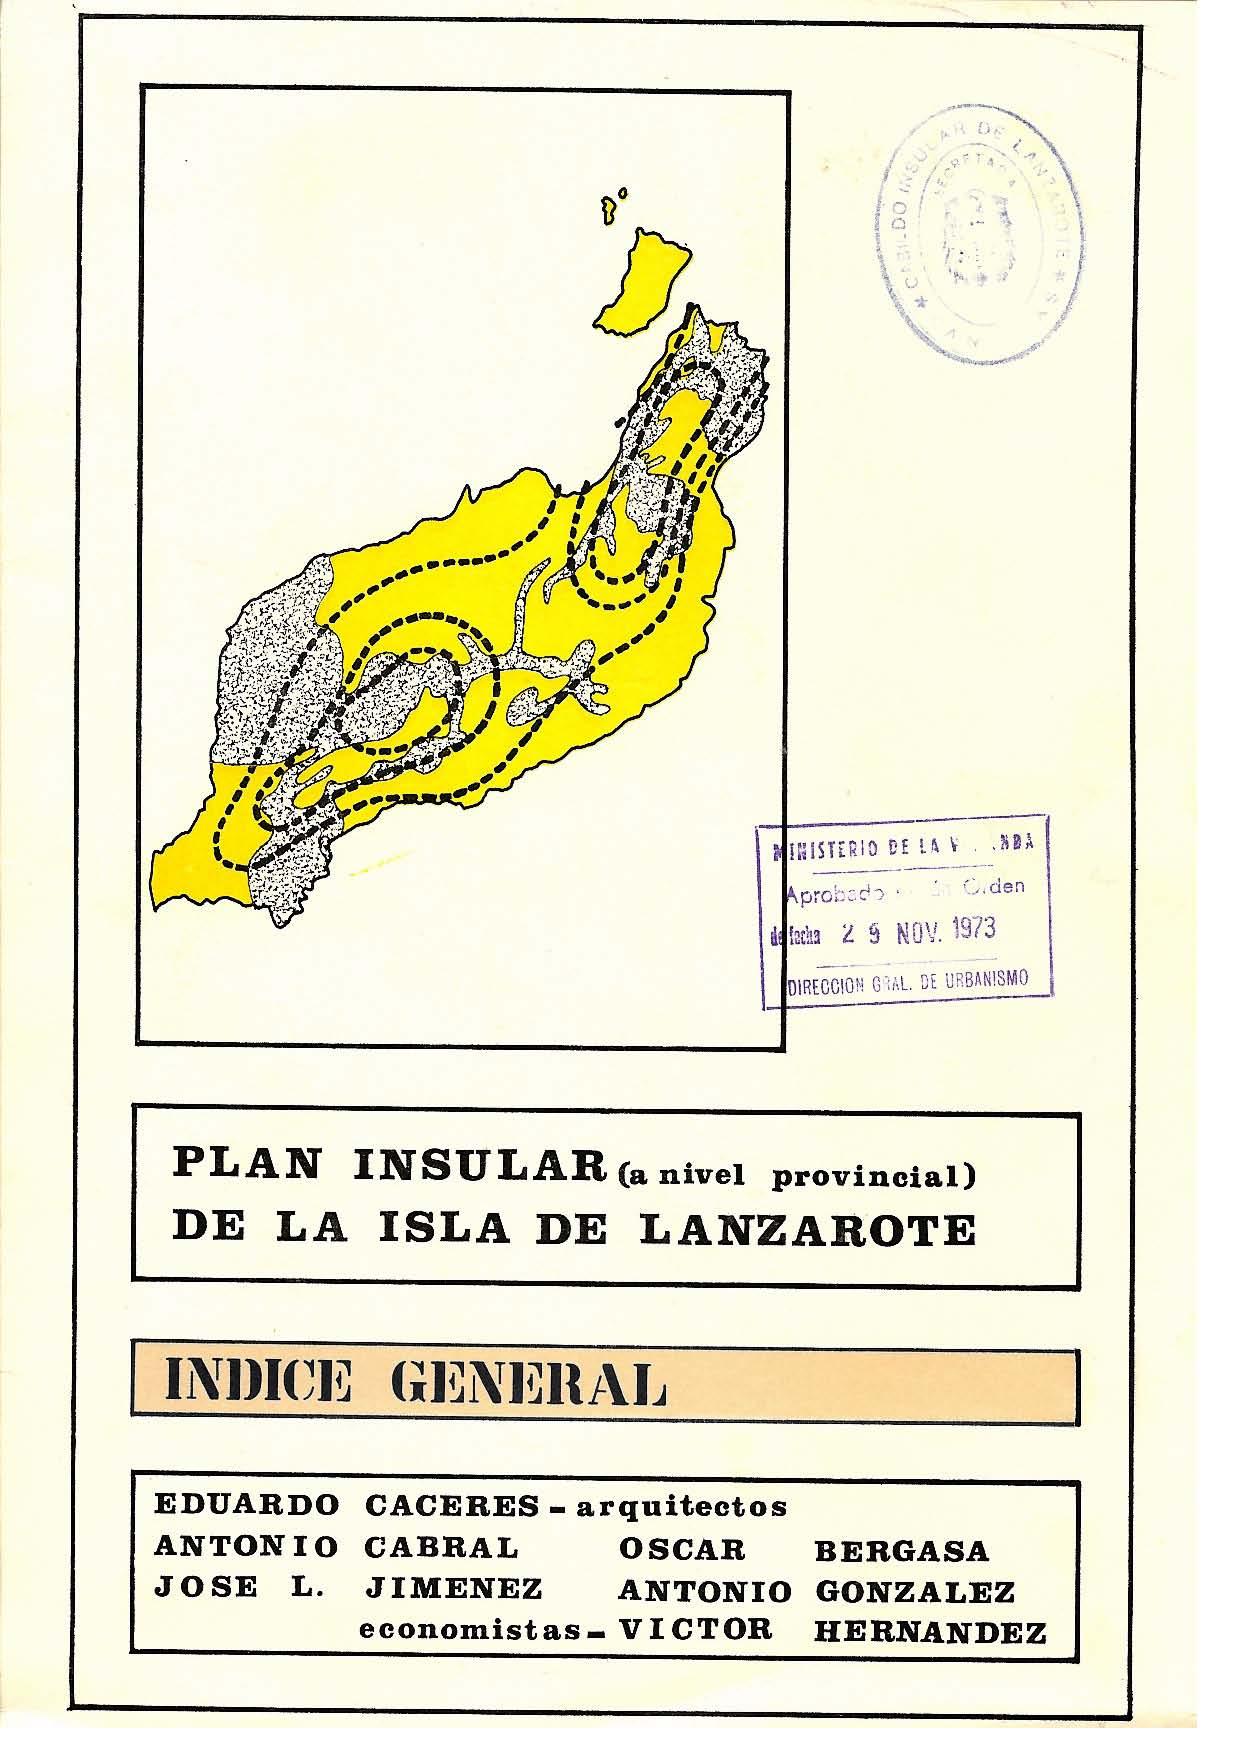 Índice General (Plan de 1973)